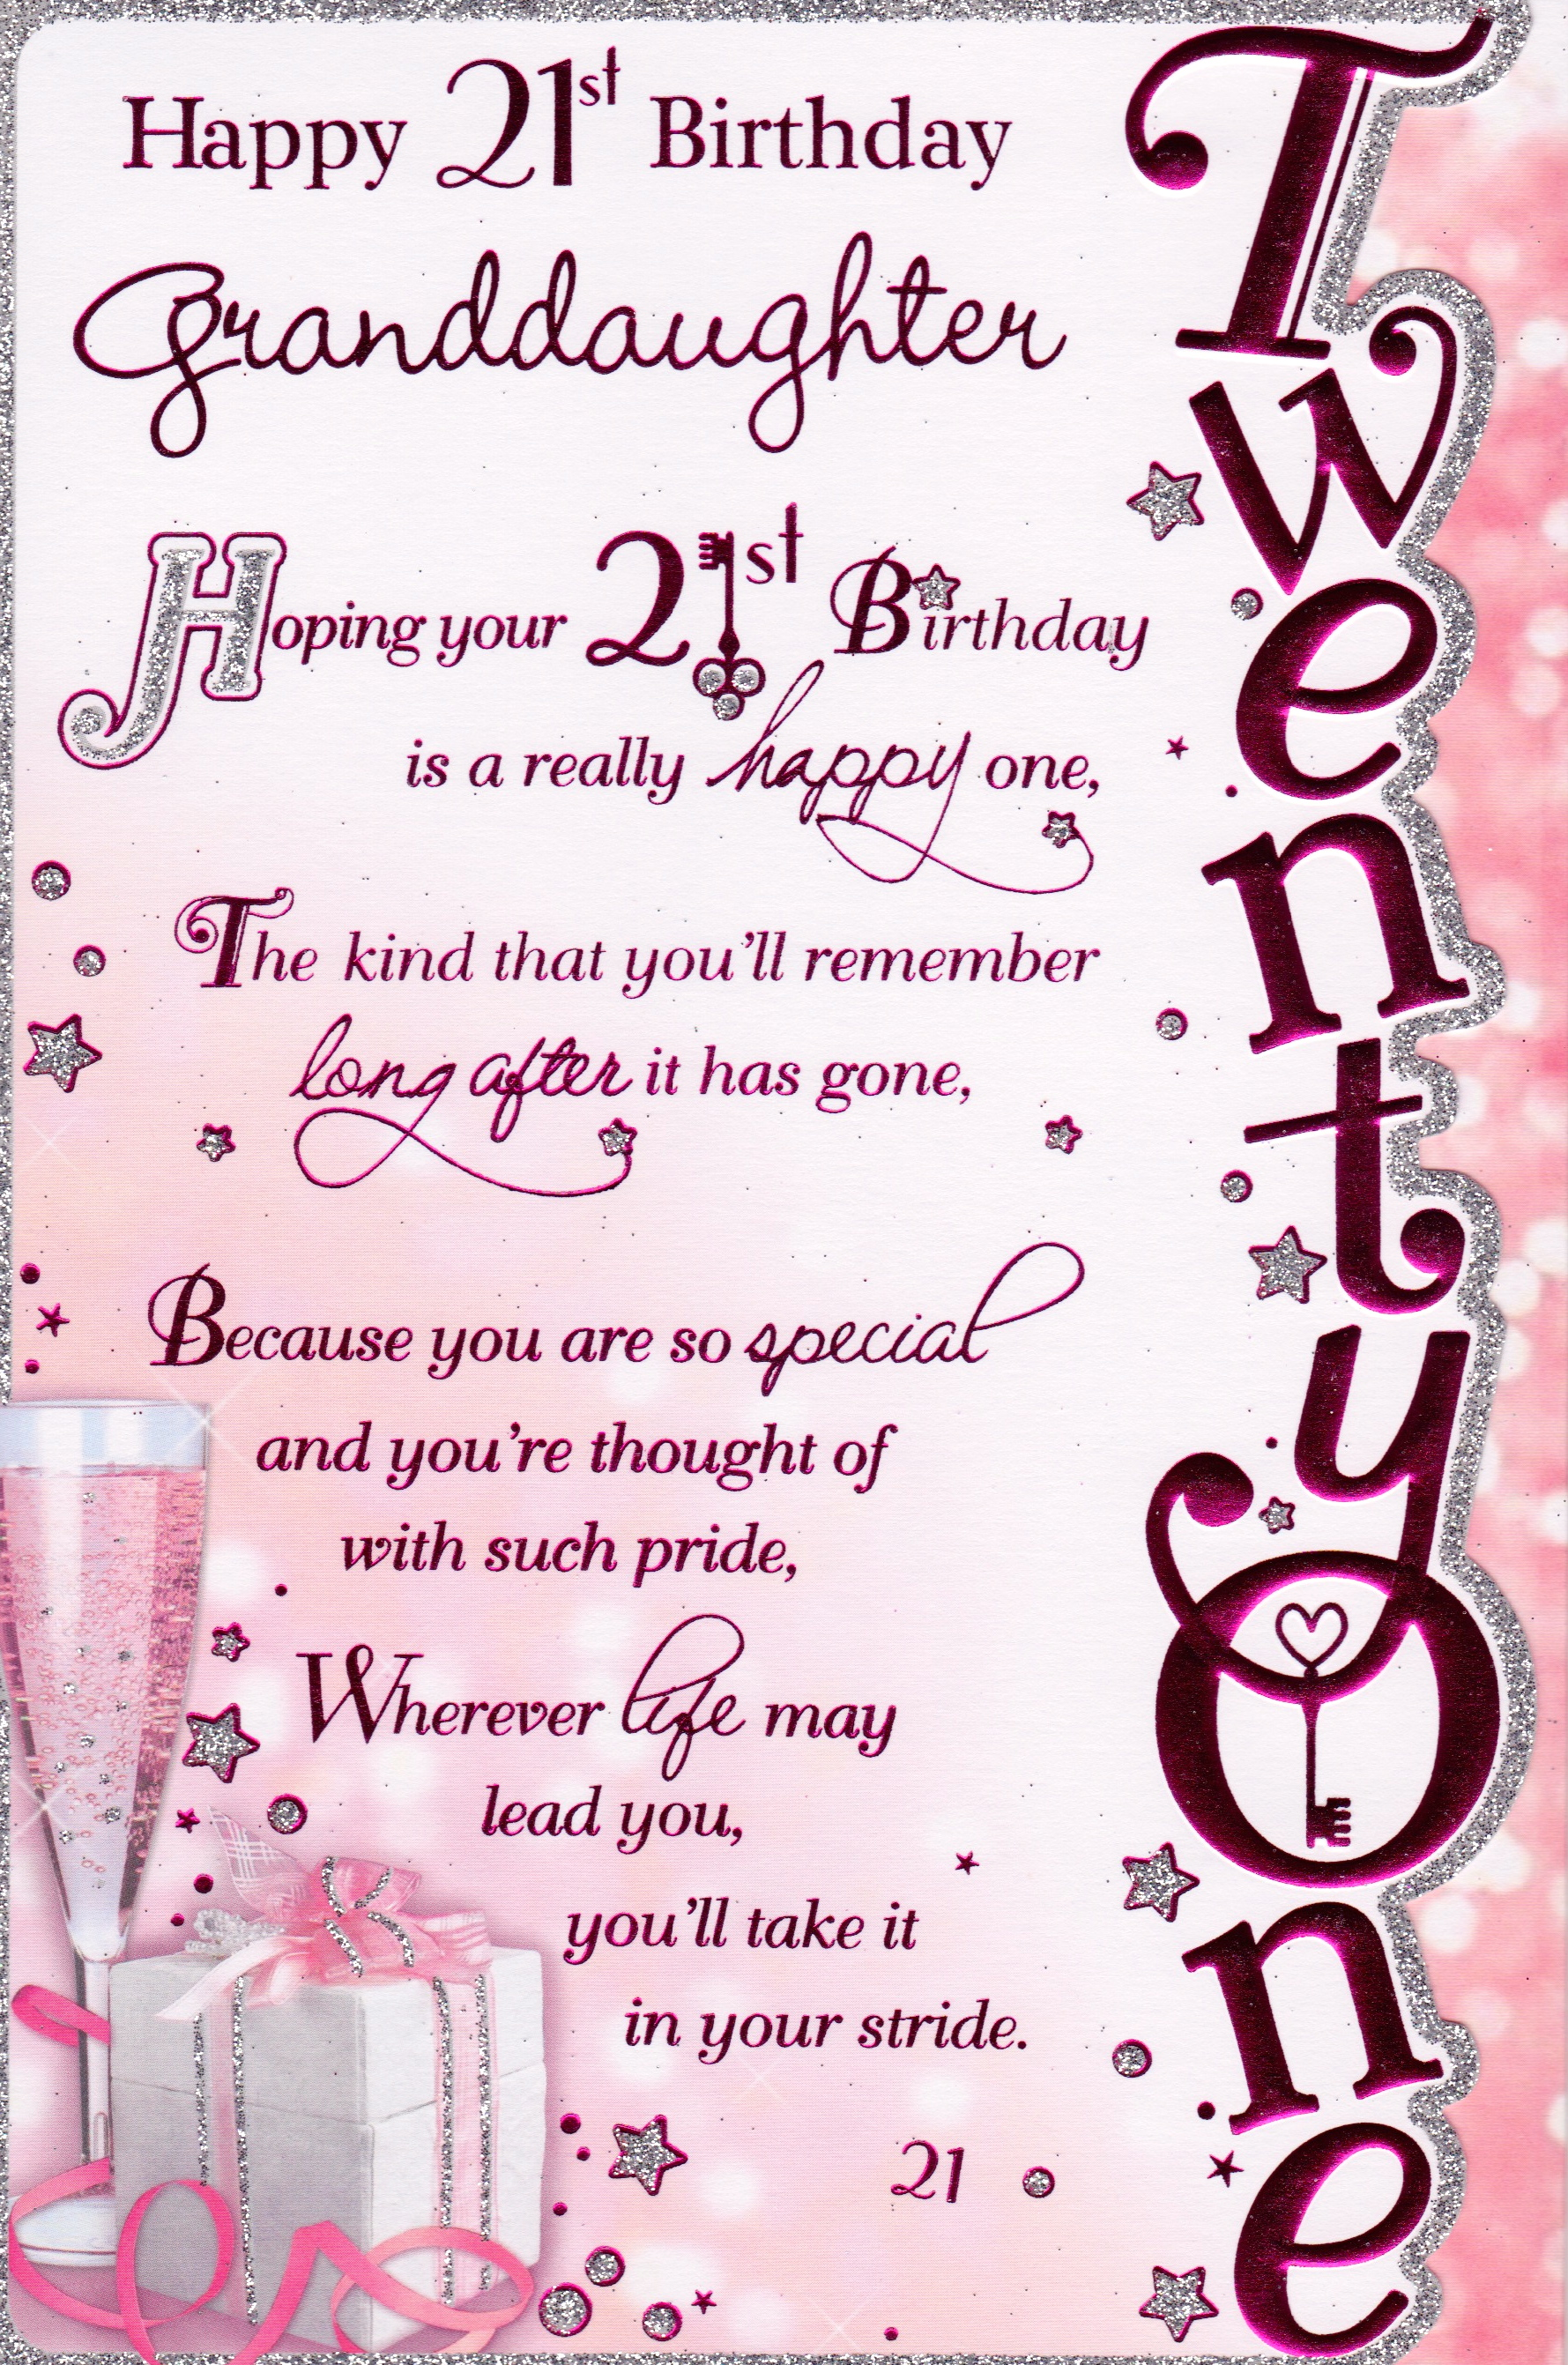 Happy 21st Birthday Daughter Quotes Quotesgram